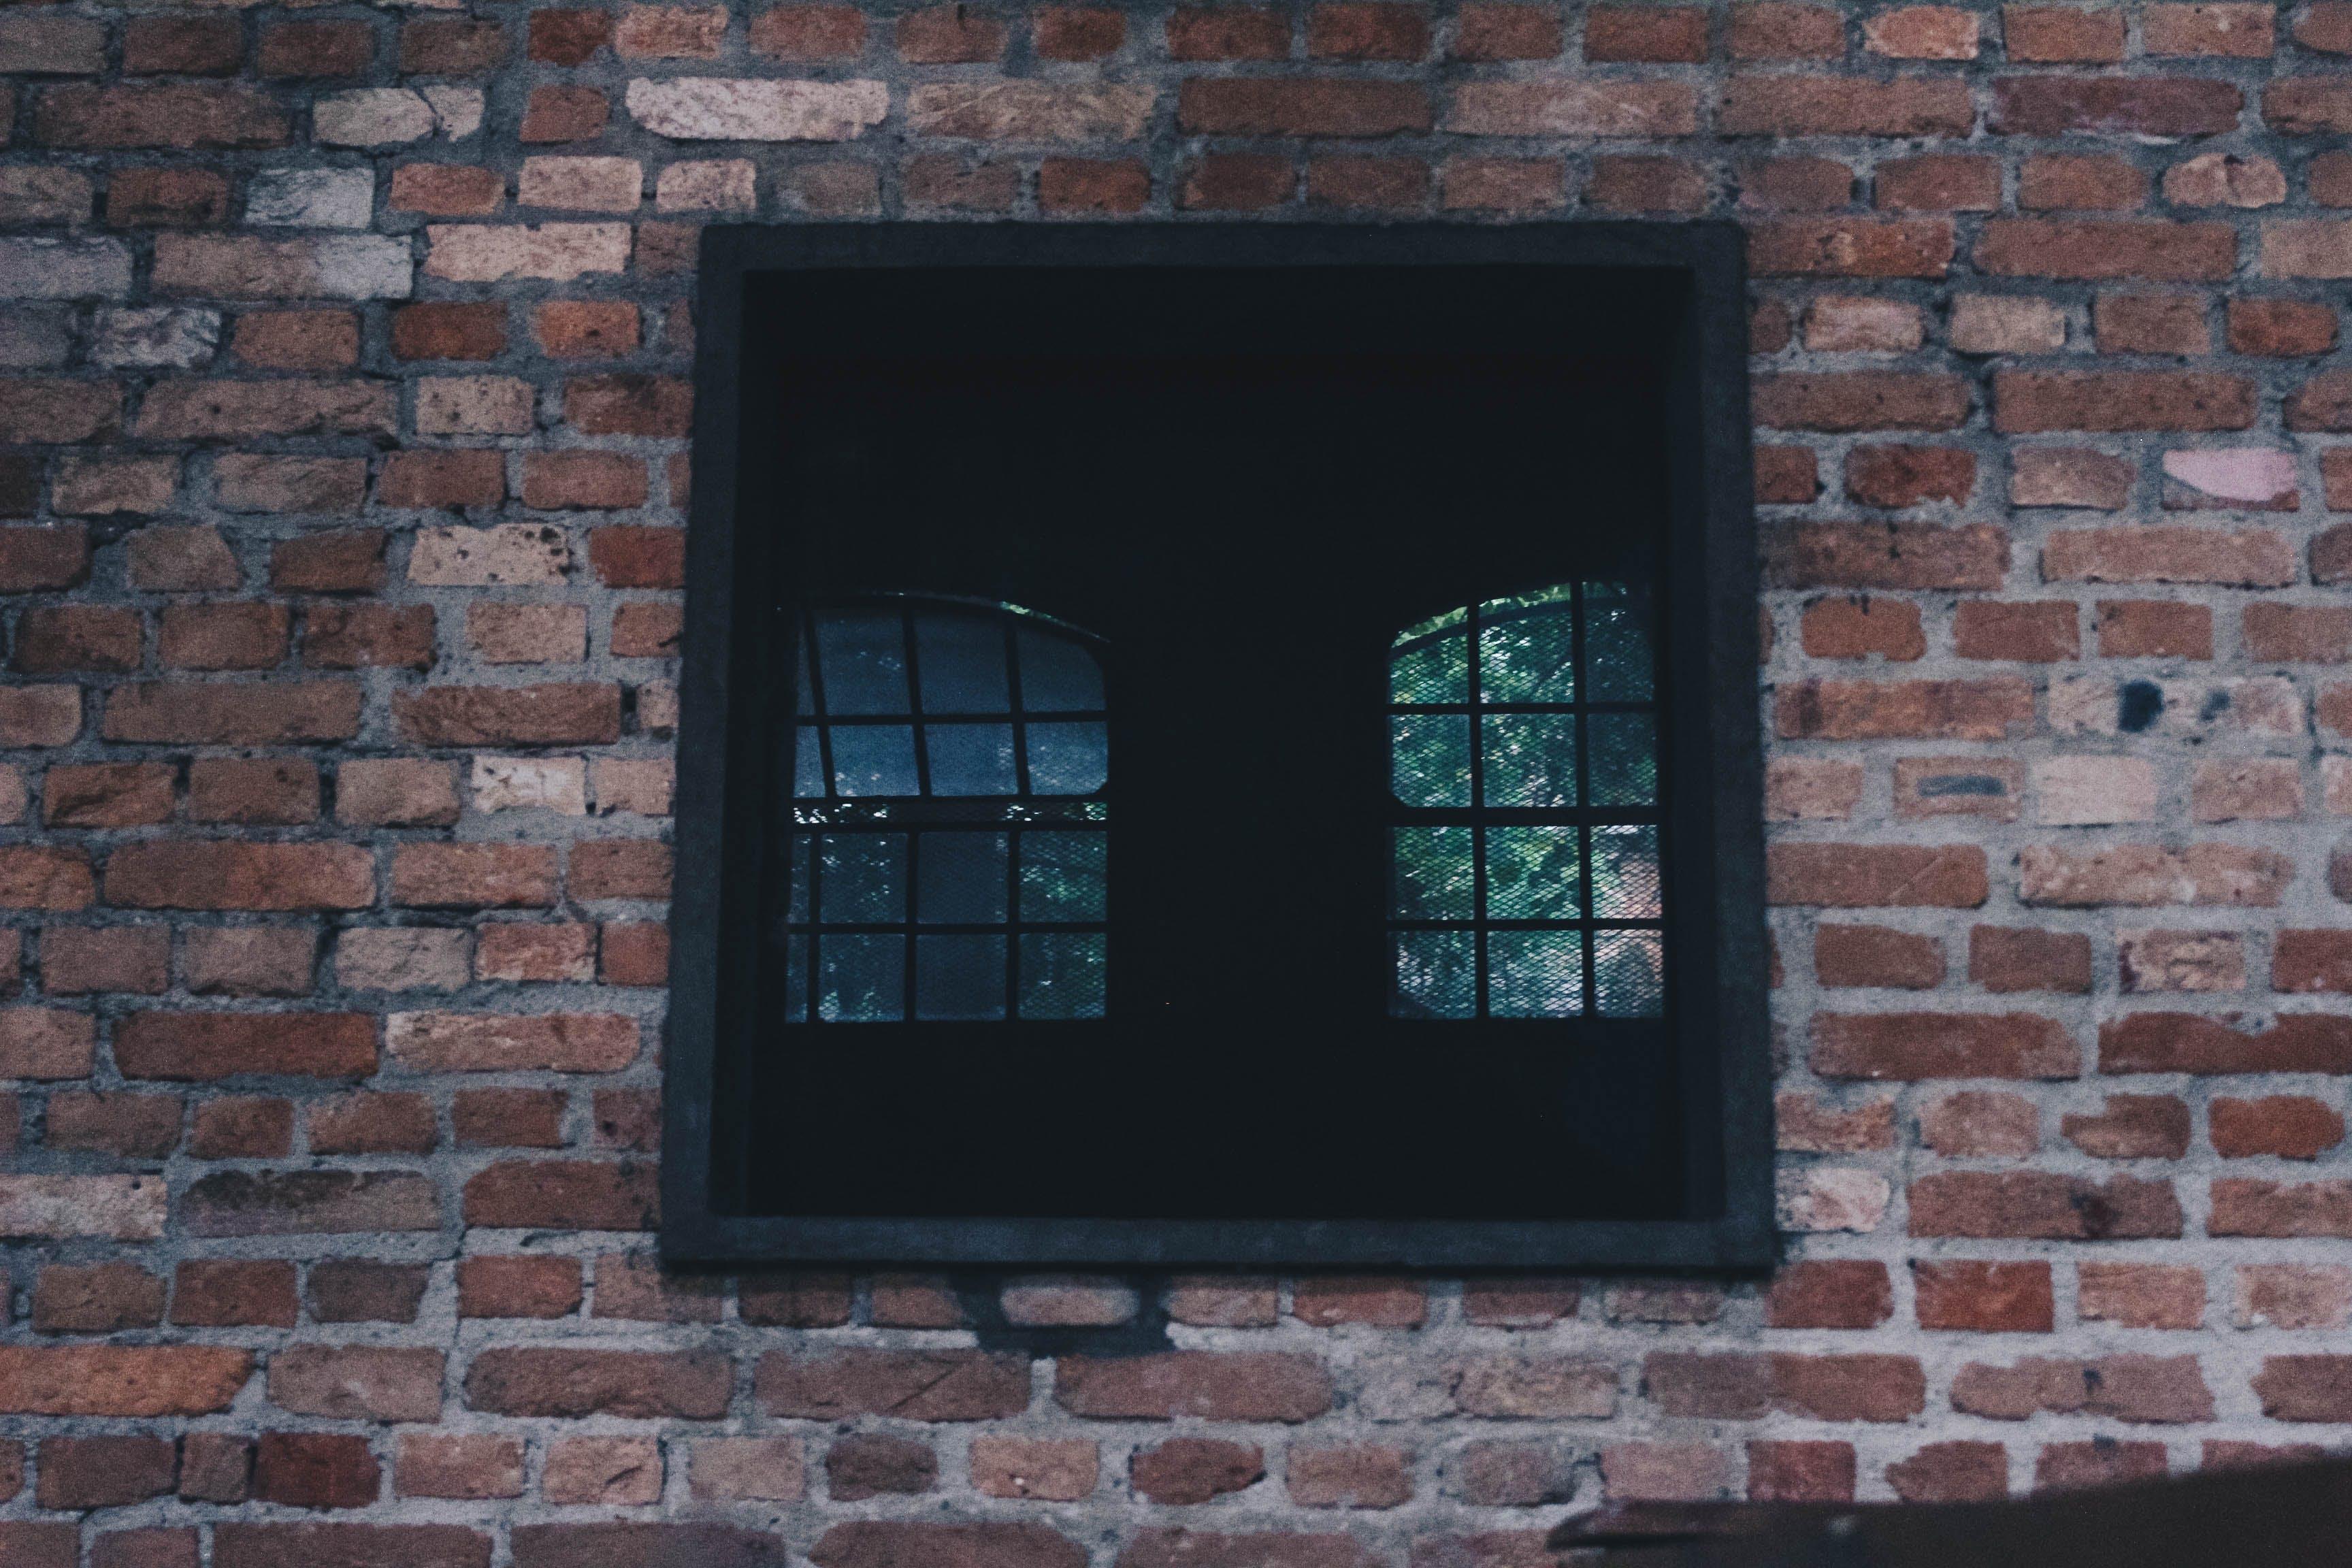 Square Black Window on Concrete Wall